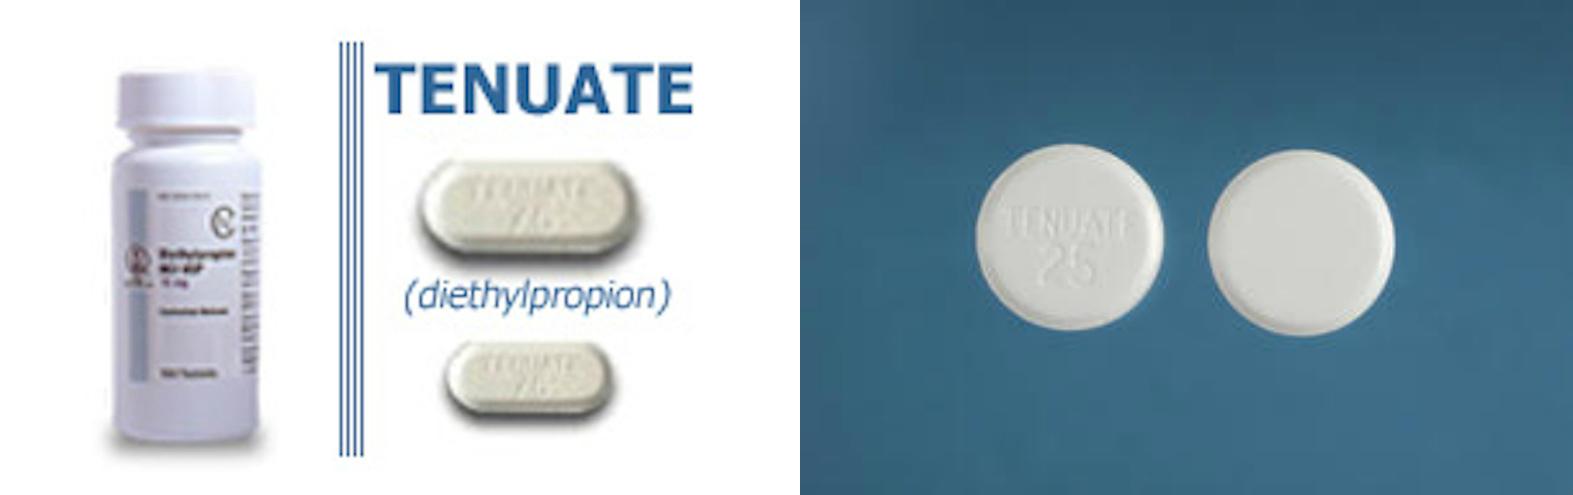 One Lucky Soul: Amphetamine, Methamphetamine, and Crystal